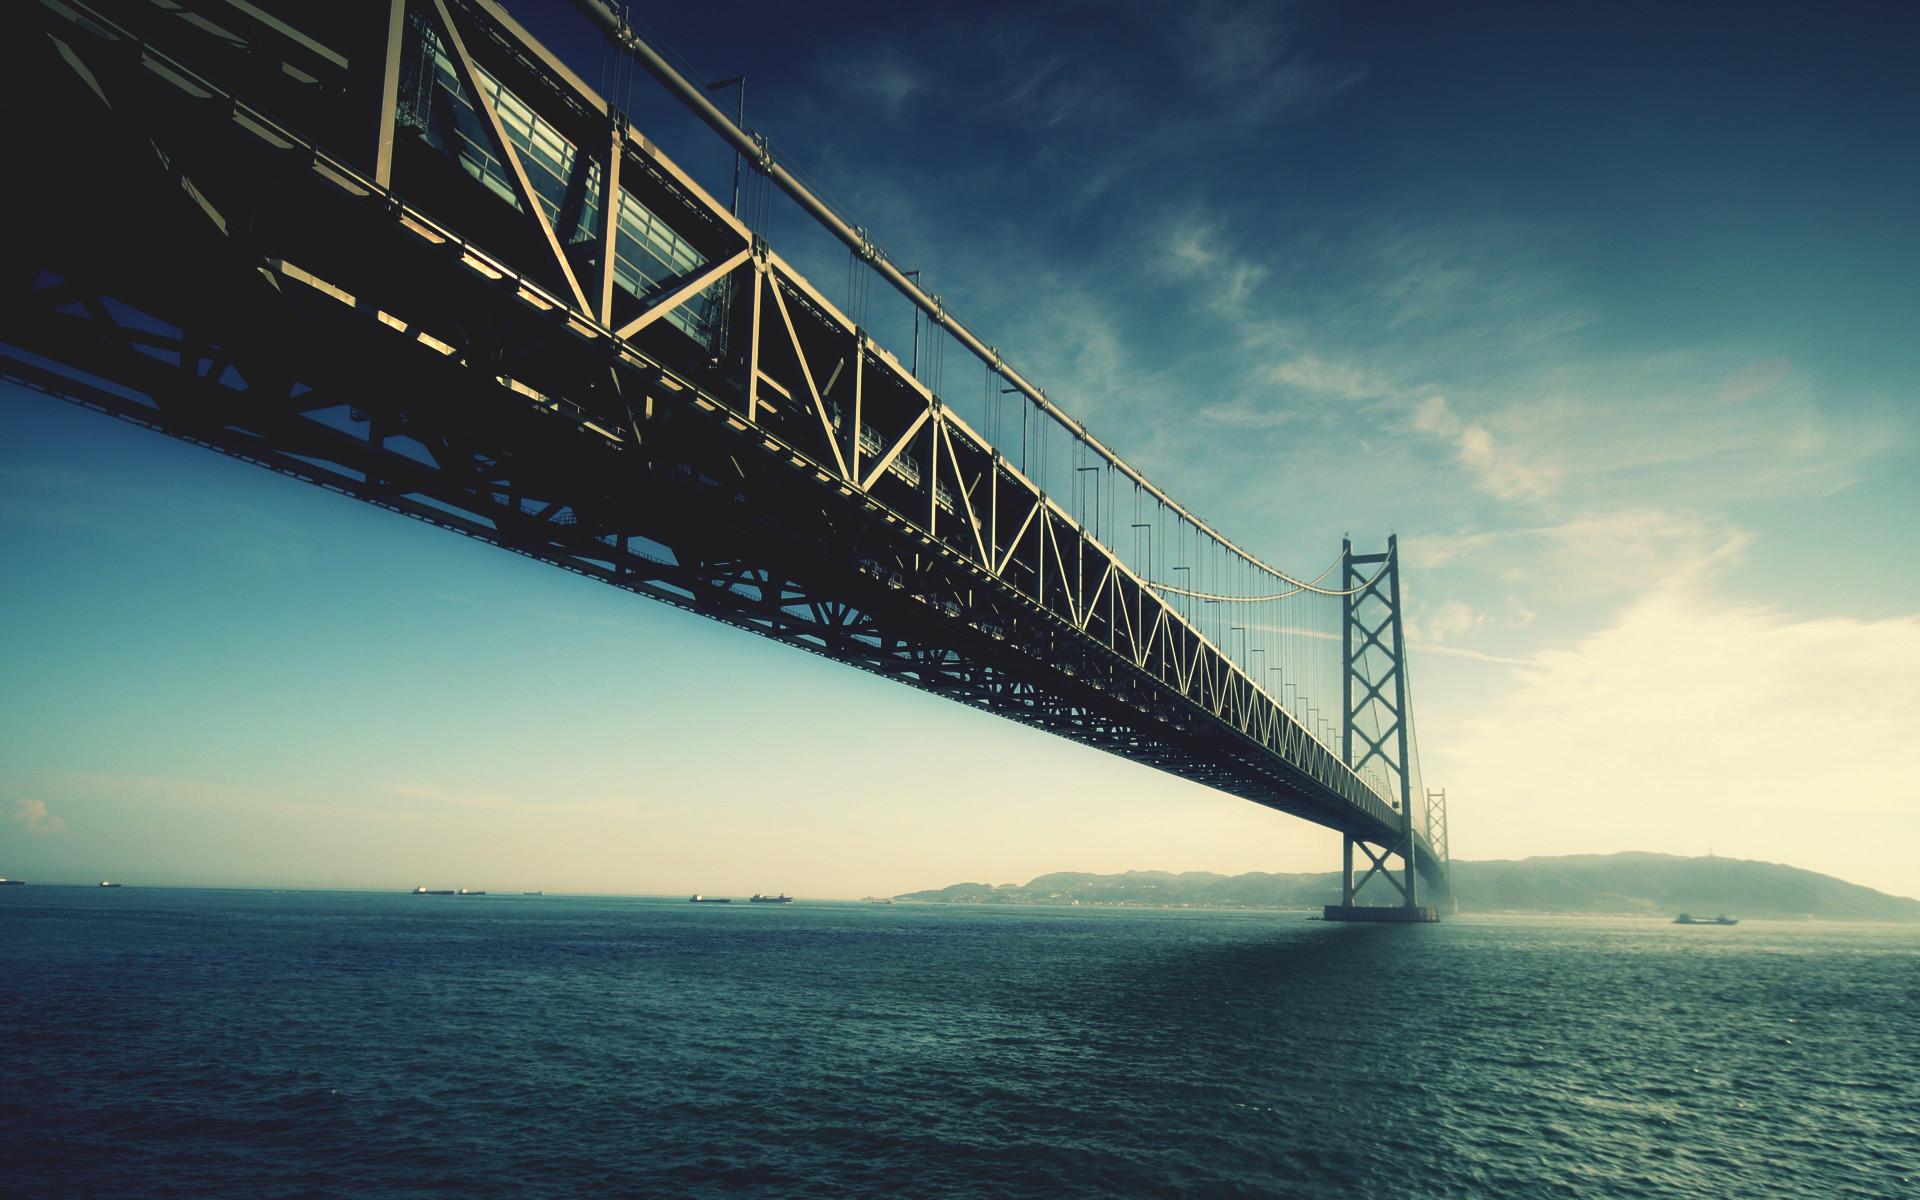 Akashi Kaikyō Bridge Japan Desktop Wallpaper Uploaded by DesktopWalls